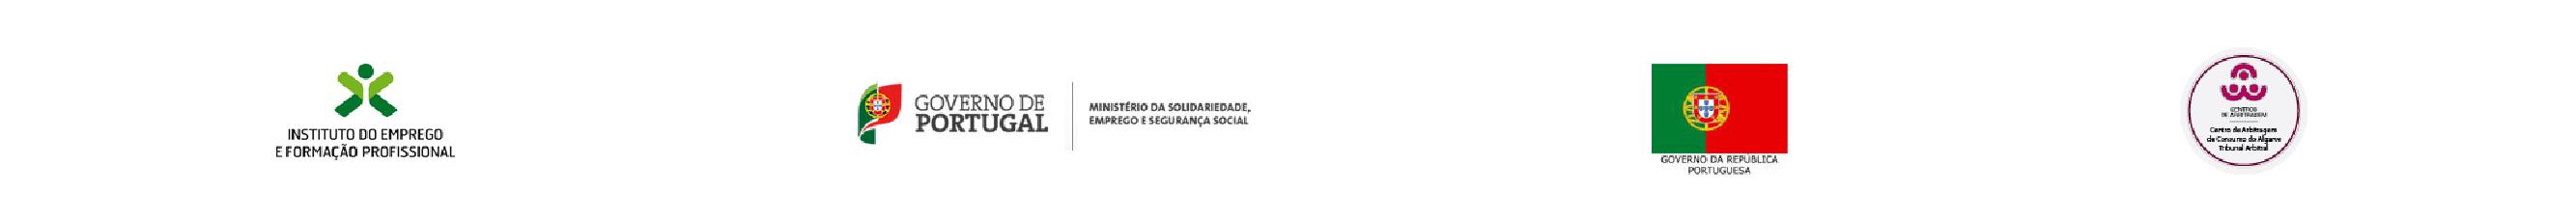 logos_obrigatorios-02-01